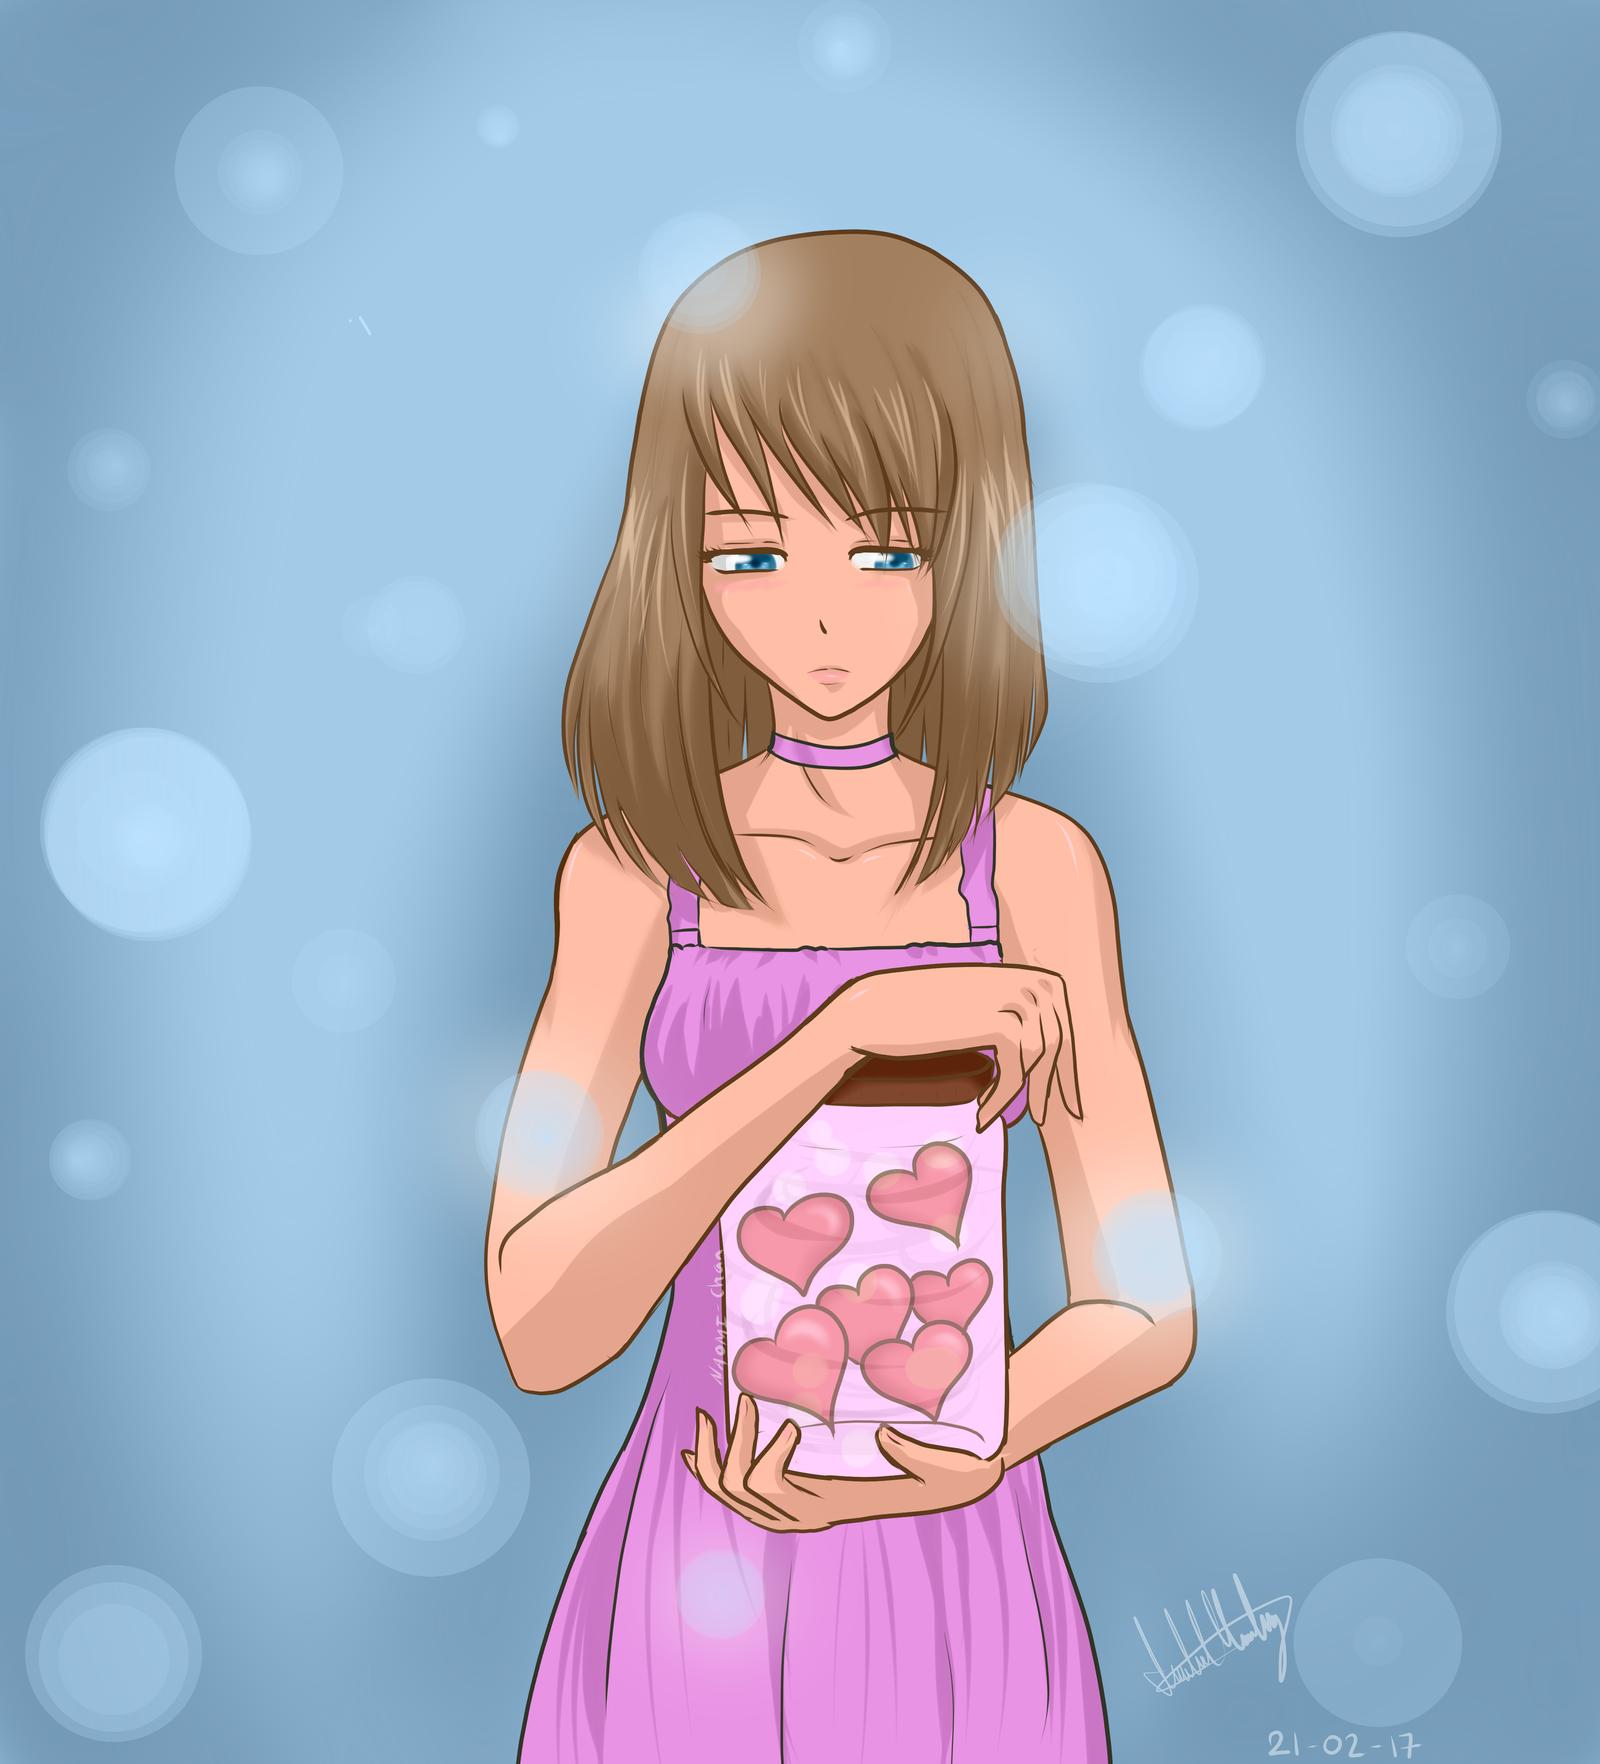 Jar Of Hearts By Nya-Neko-Naomi-Chan On DeviantArt